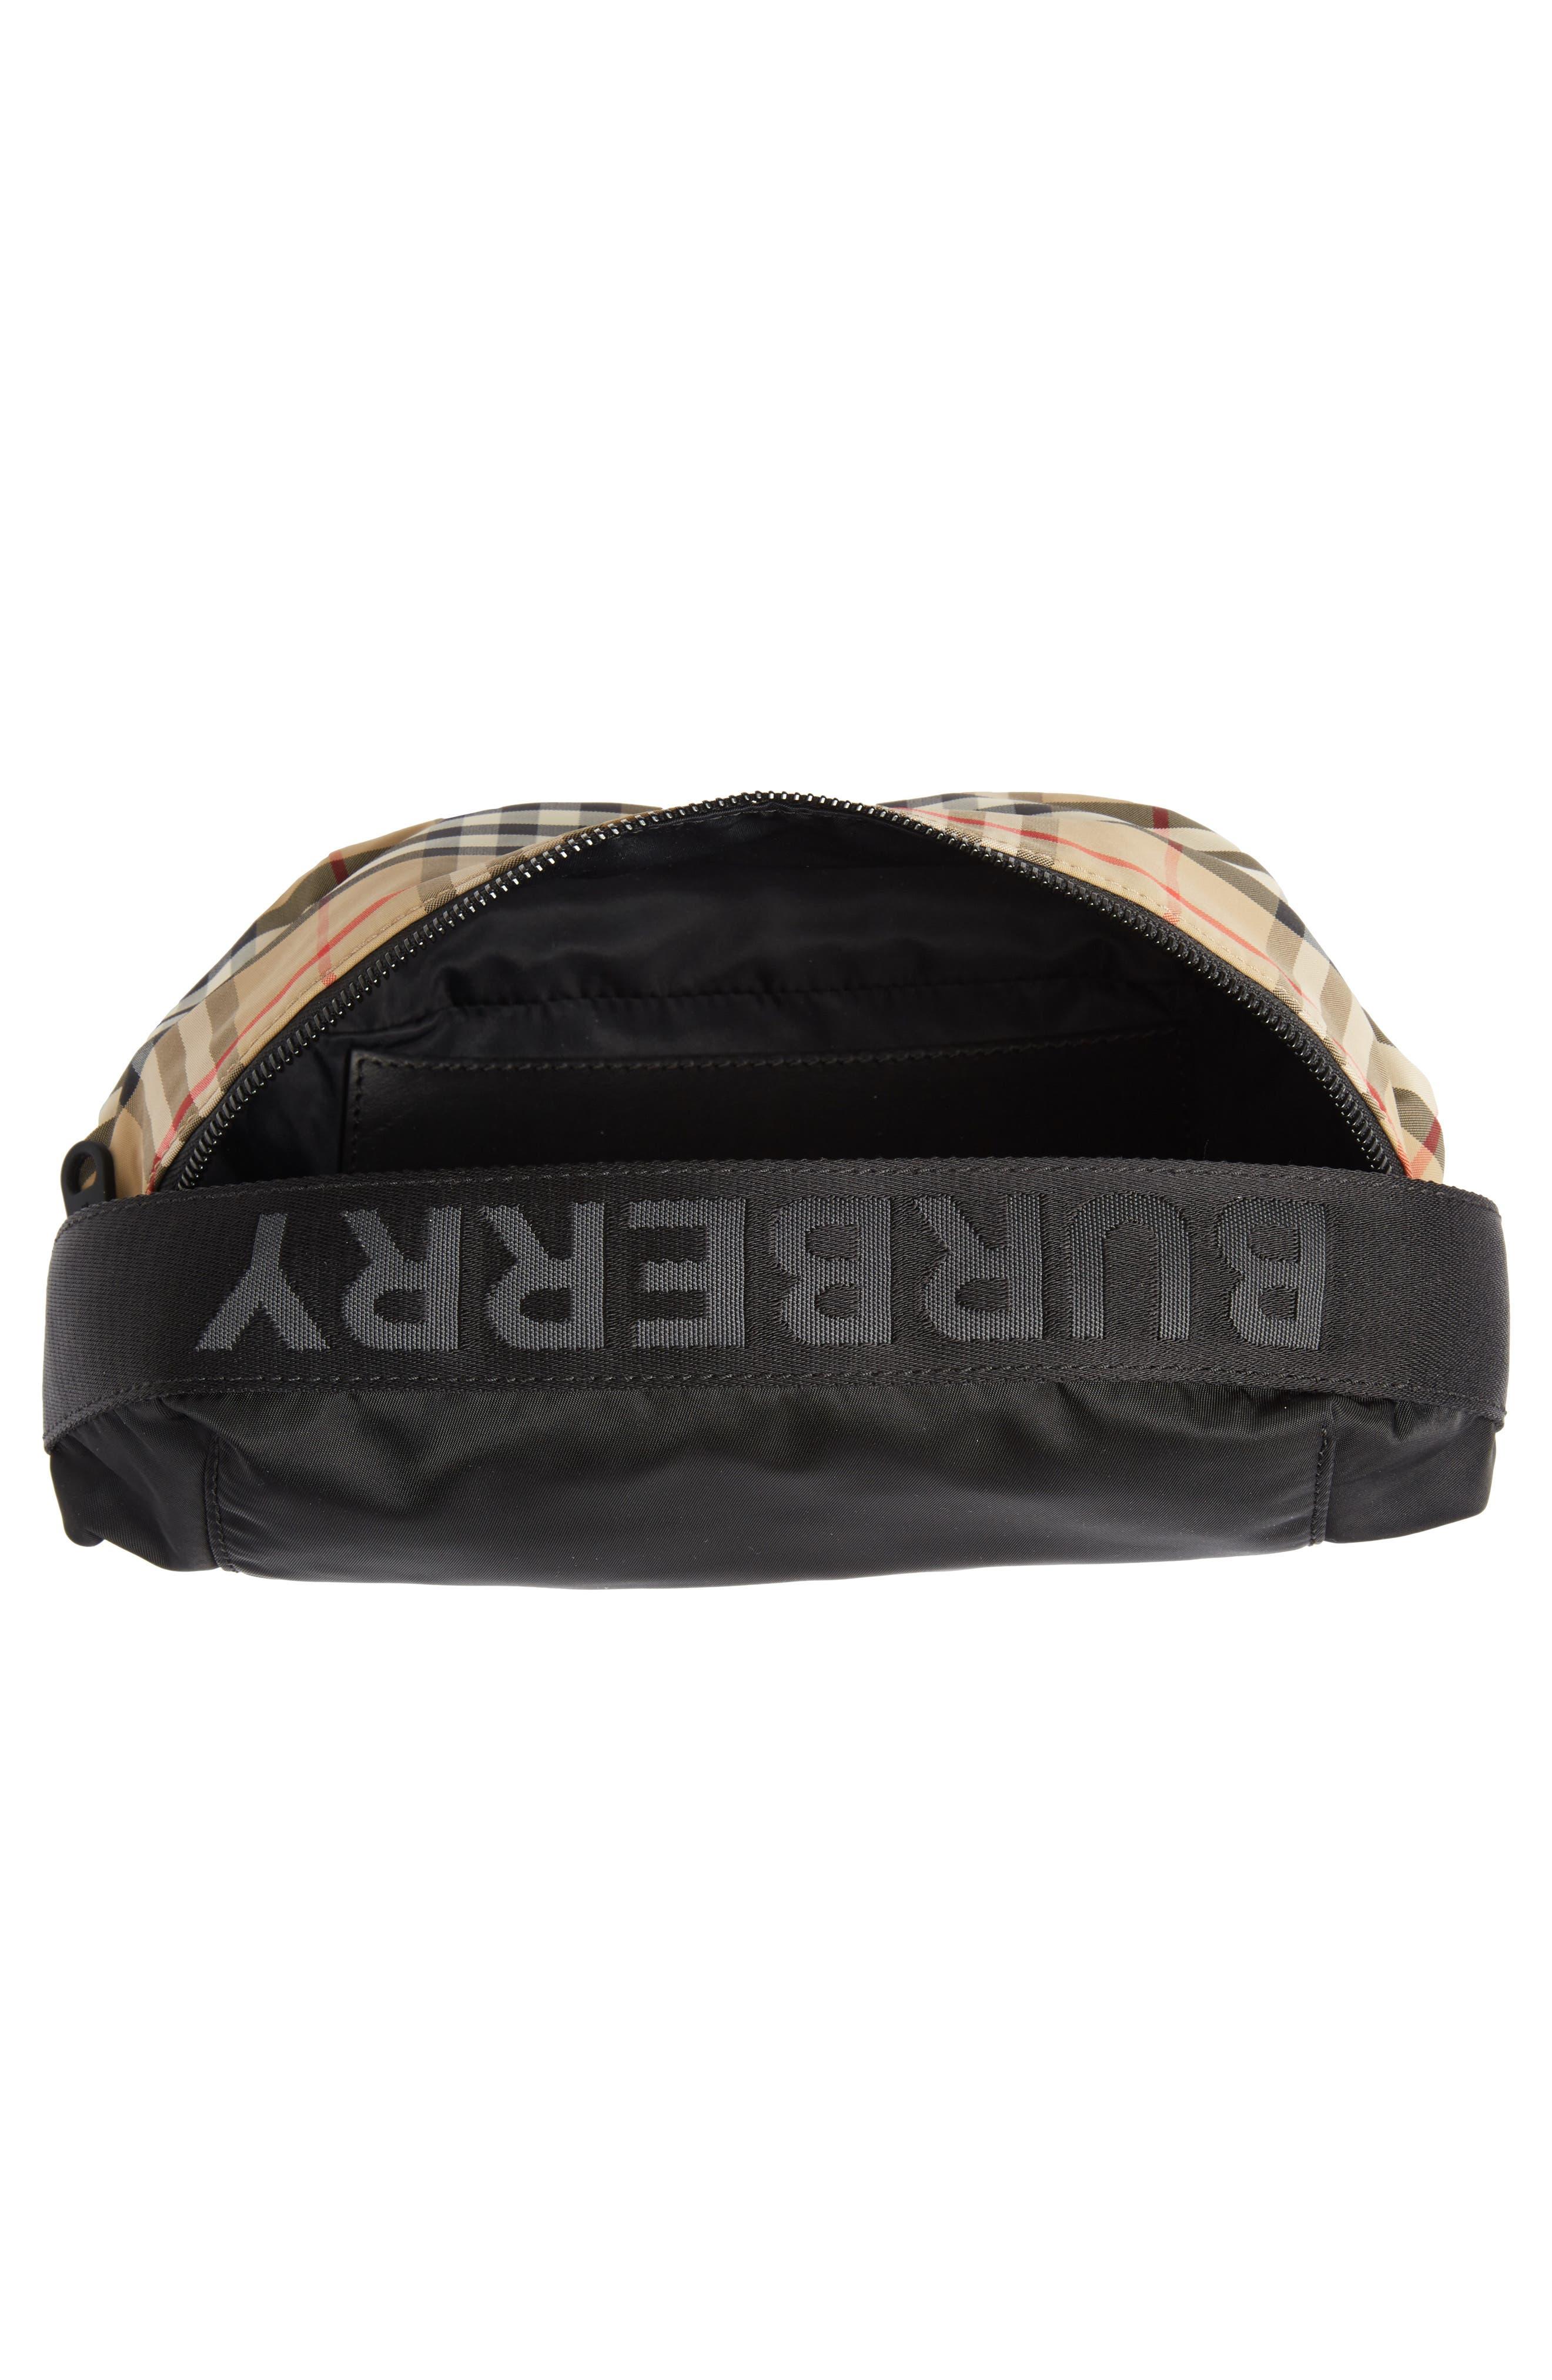 BURBERRY,                             Burberrry Medium Sonny Vintage Check Belt Bag,                             Alternate thumbnail 5, color,                             ARCHIVE BEIGE